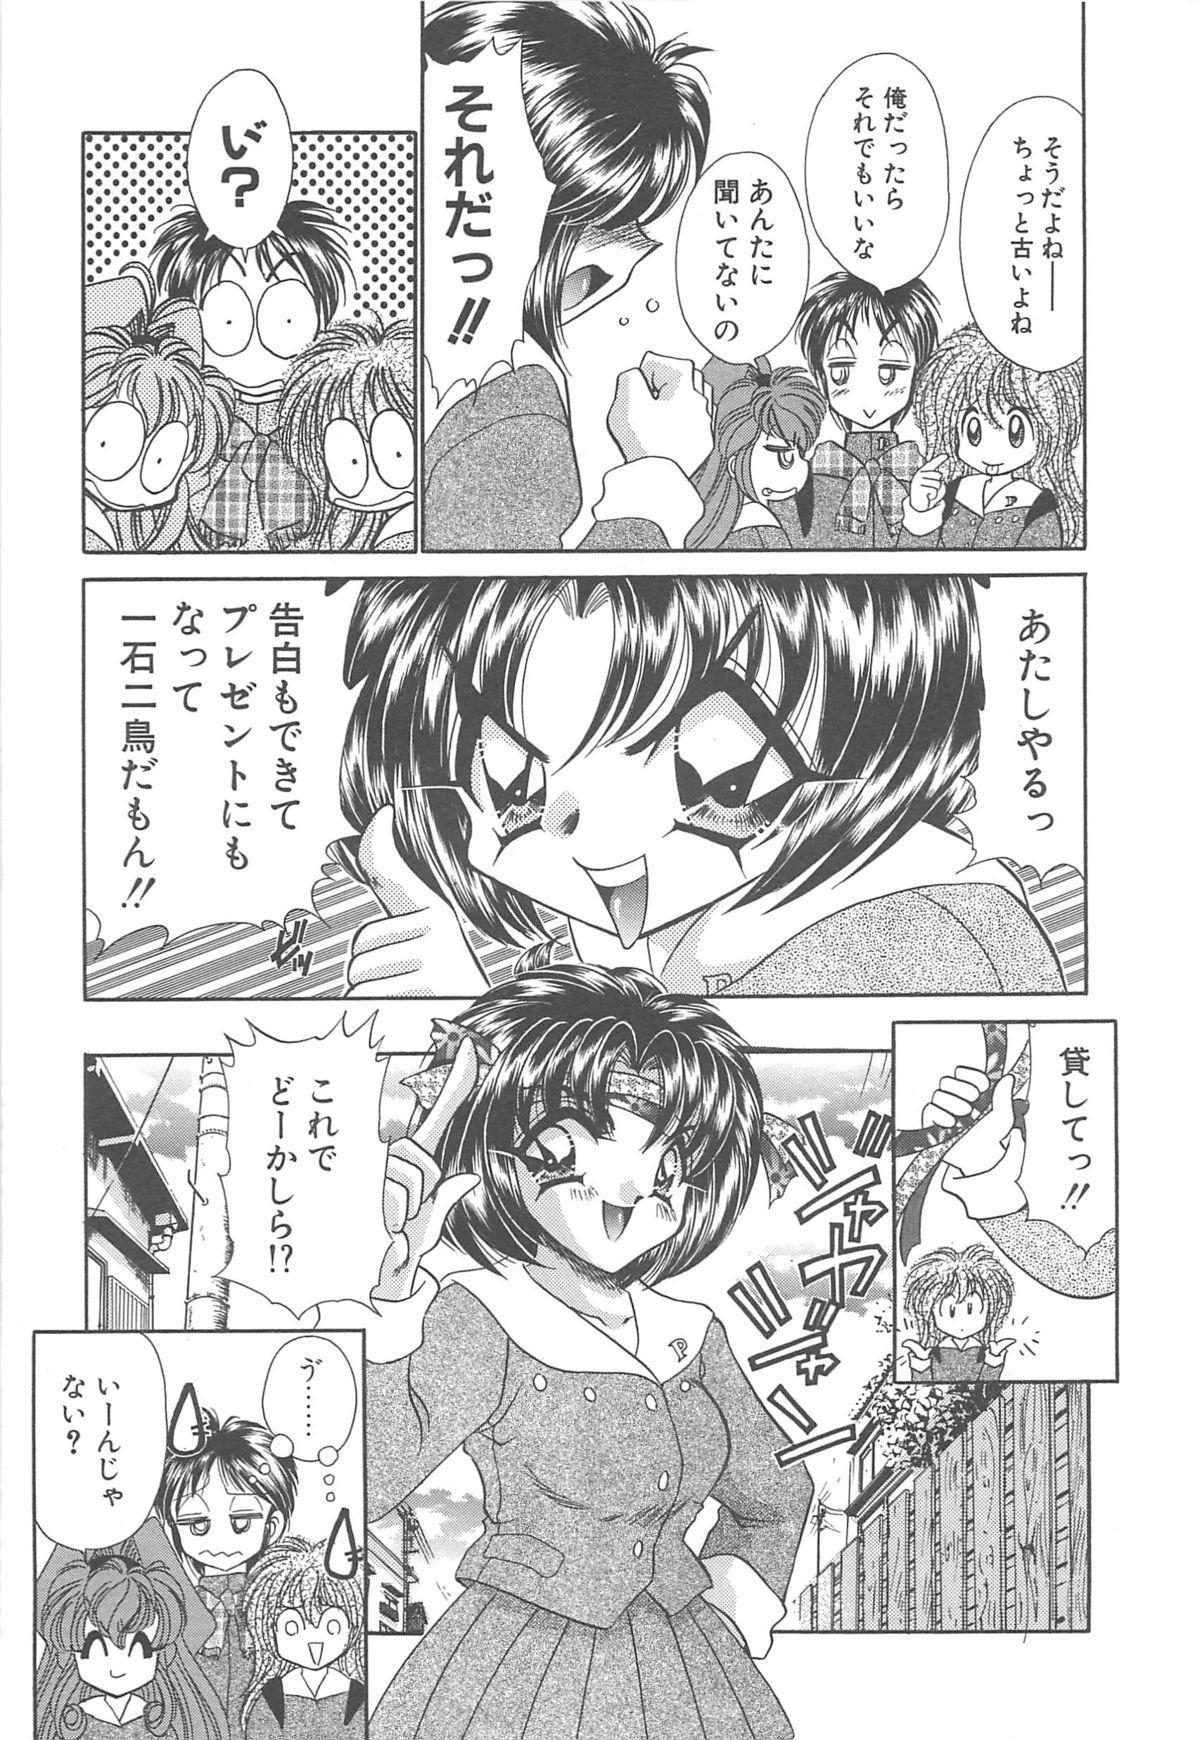 Kigurumi Sentai Quiltian 109